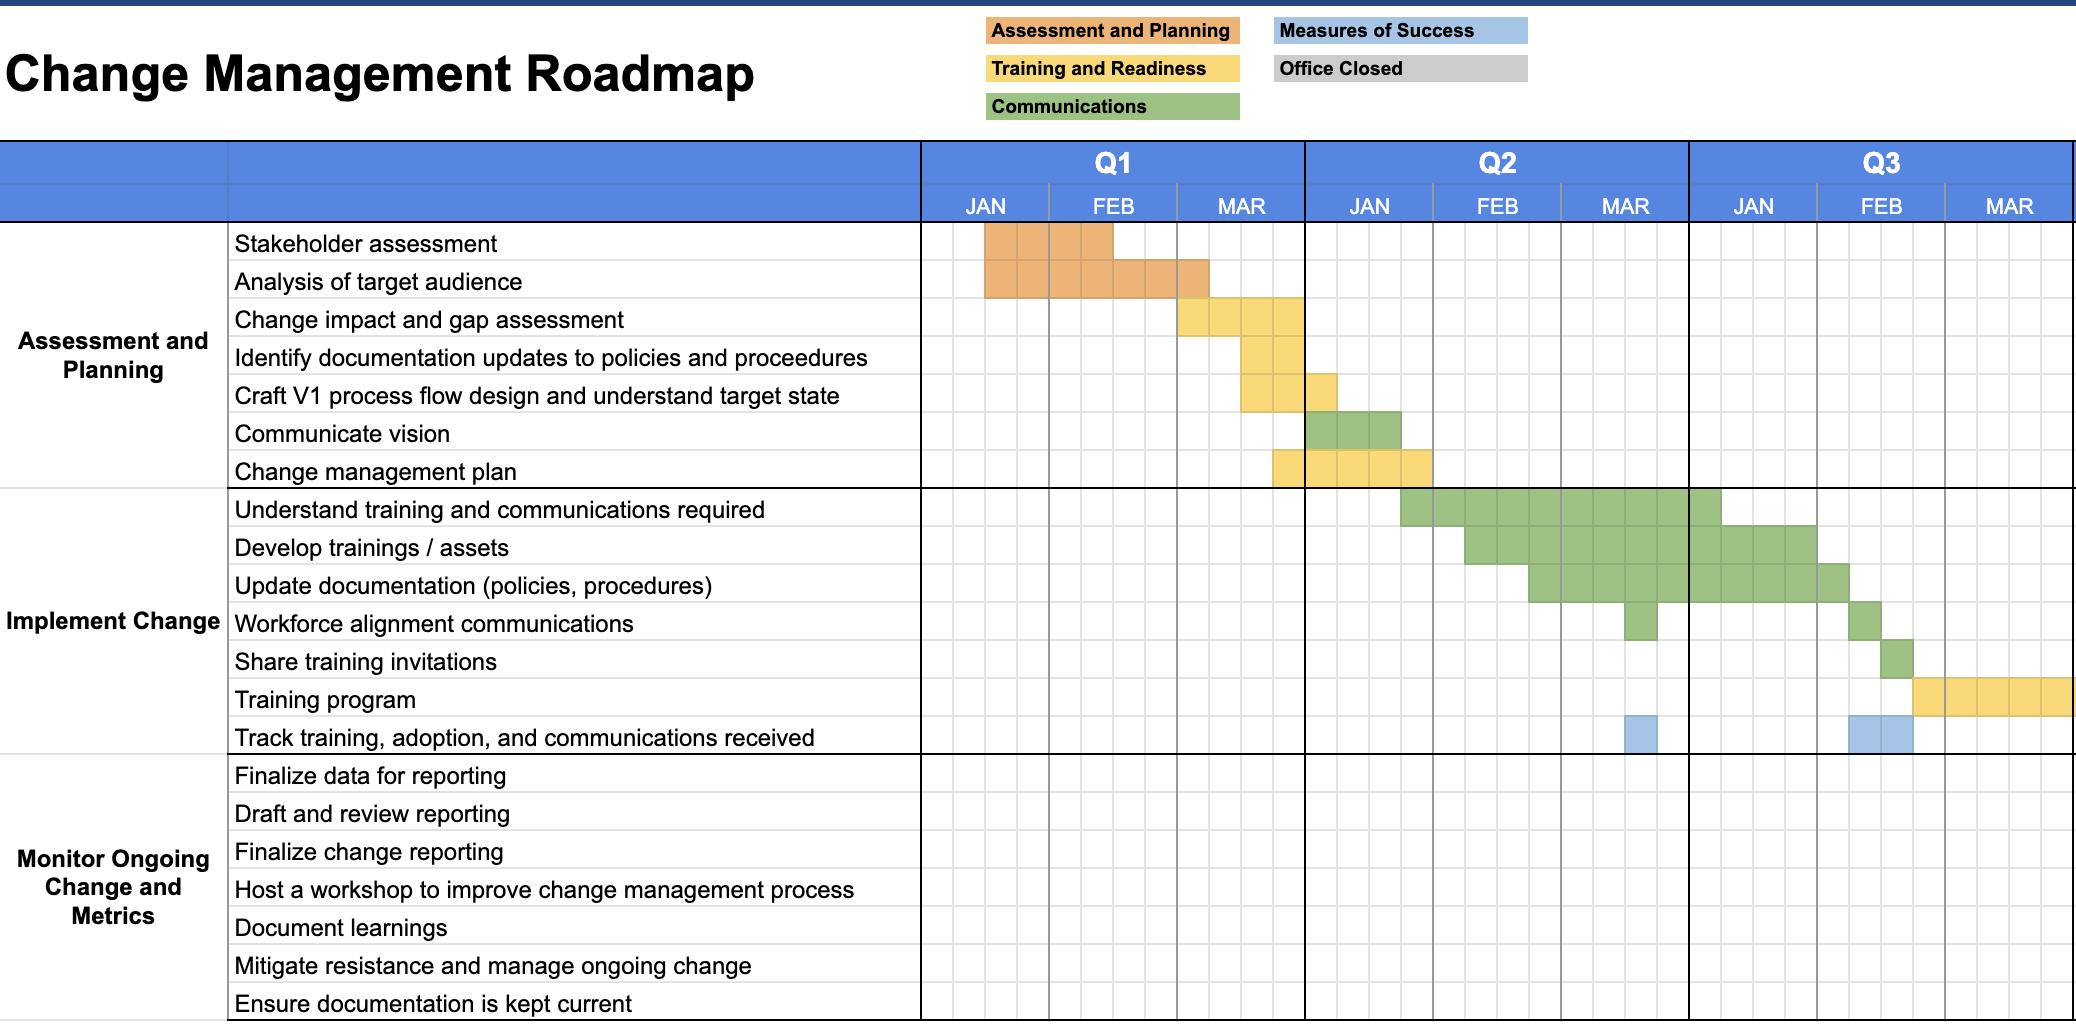 Change Management Plan Roadmap